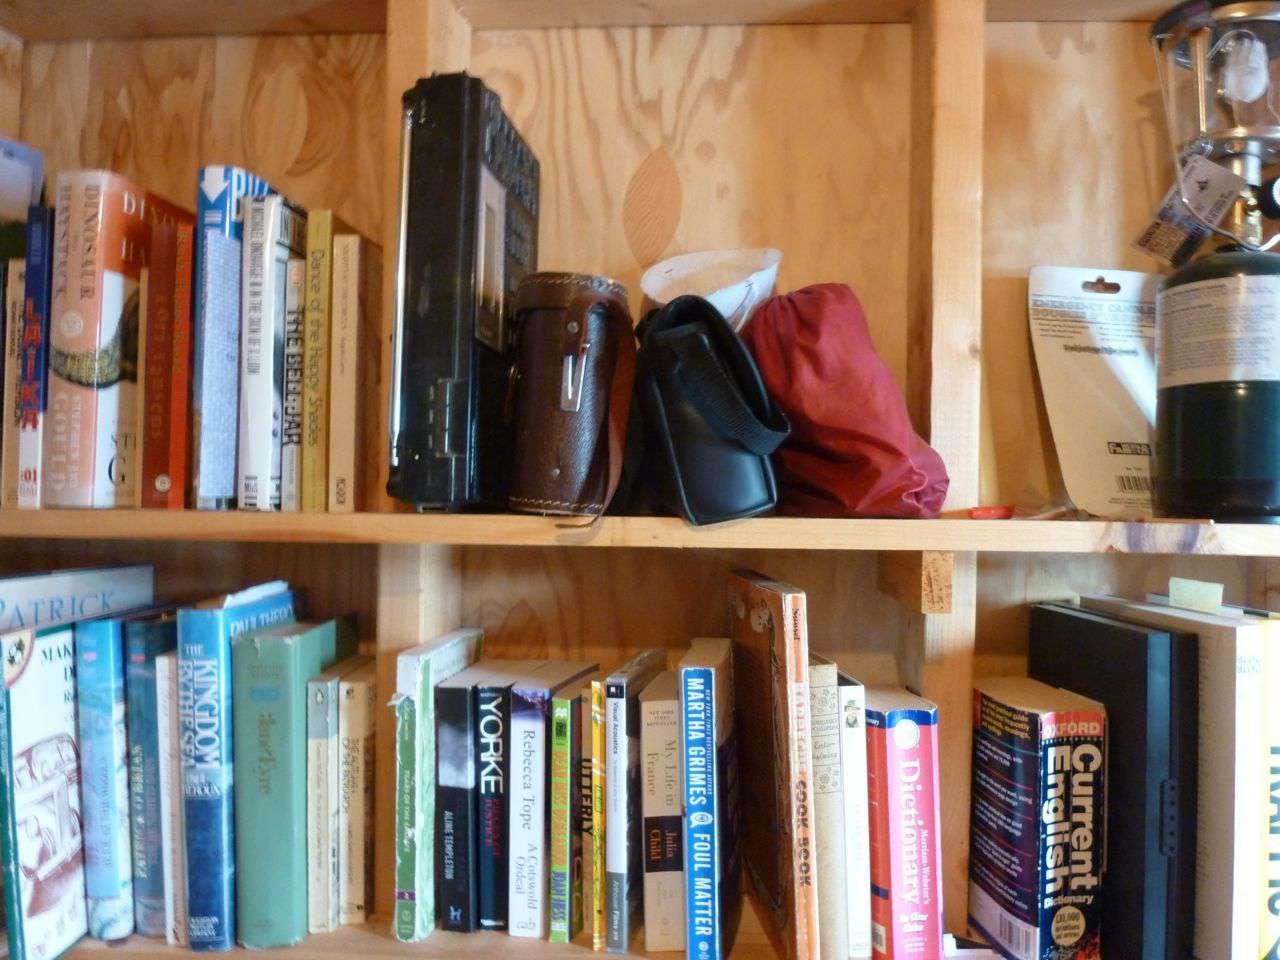 Bookshelves with books on them